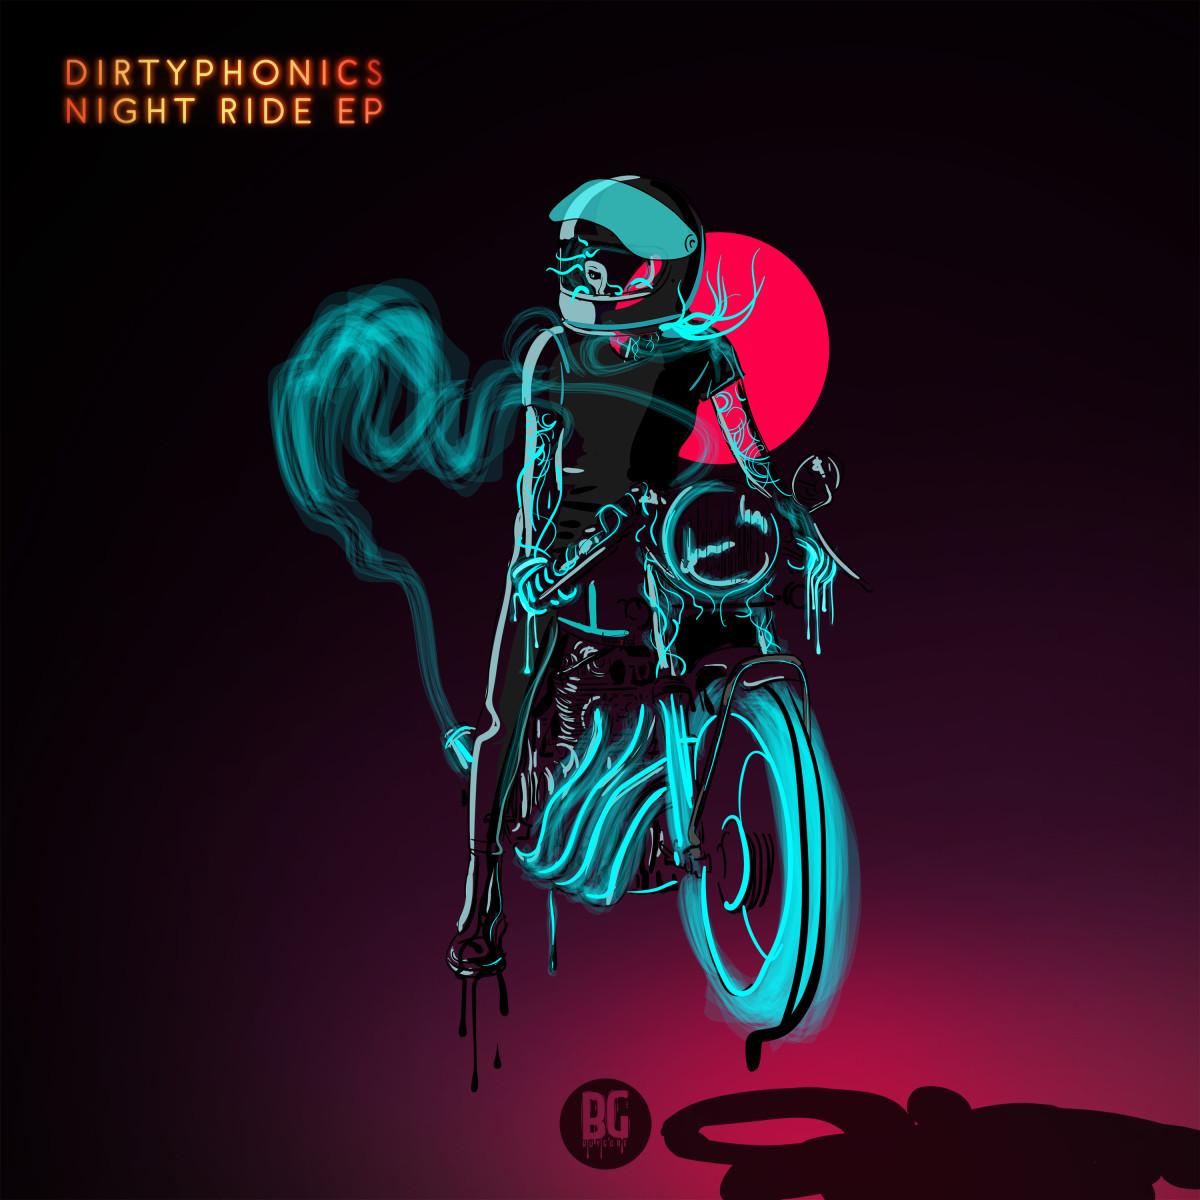 Dirtyphonics - Night Ride EP 3000x3000